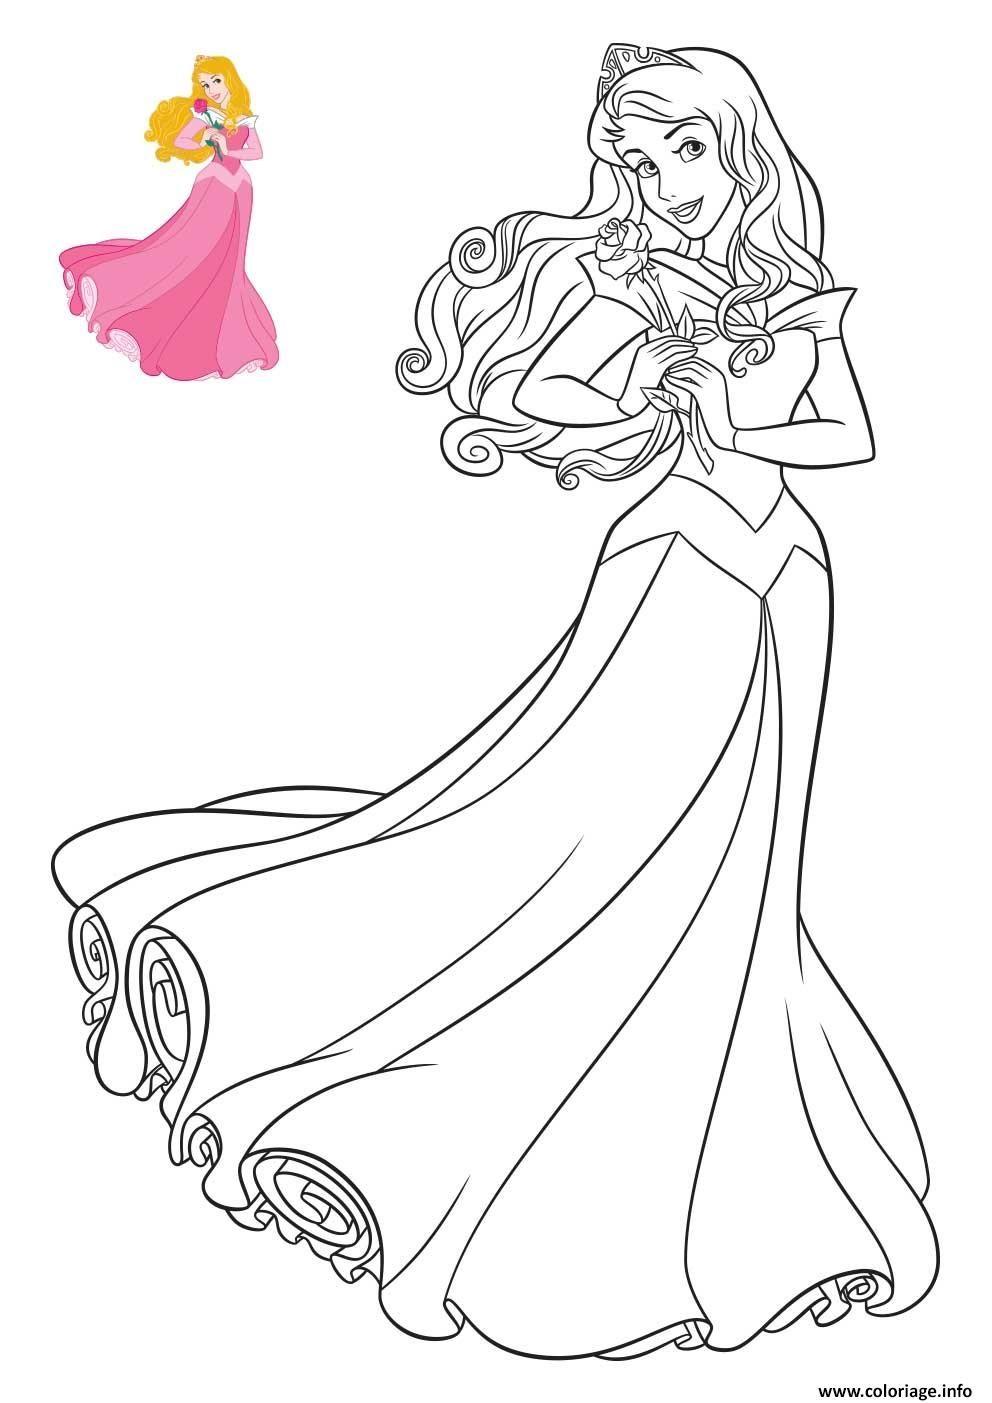 Coloriage Princesse Disney Aurore à imprimer  Coloriage princesse